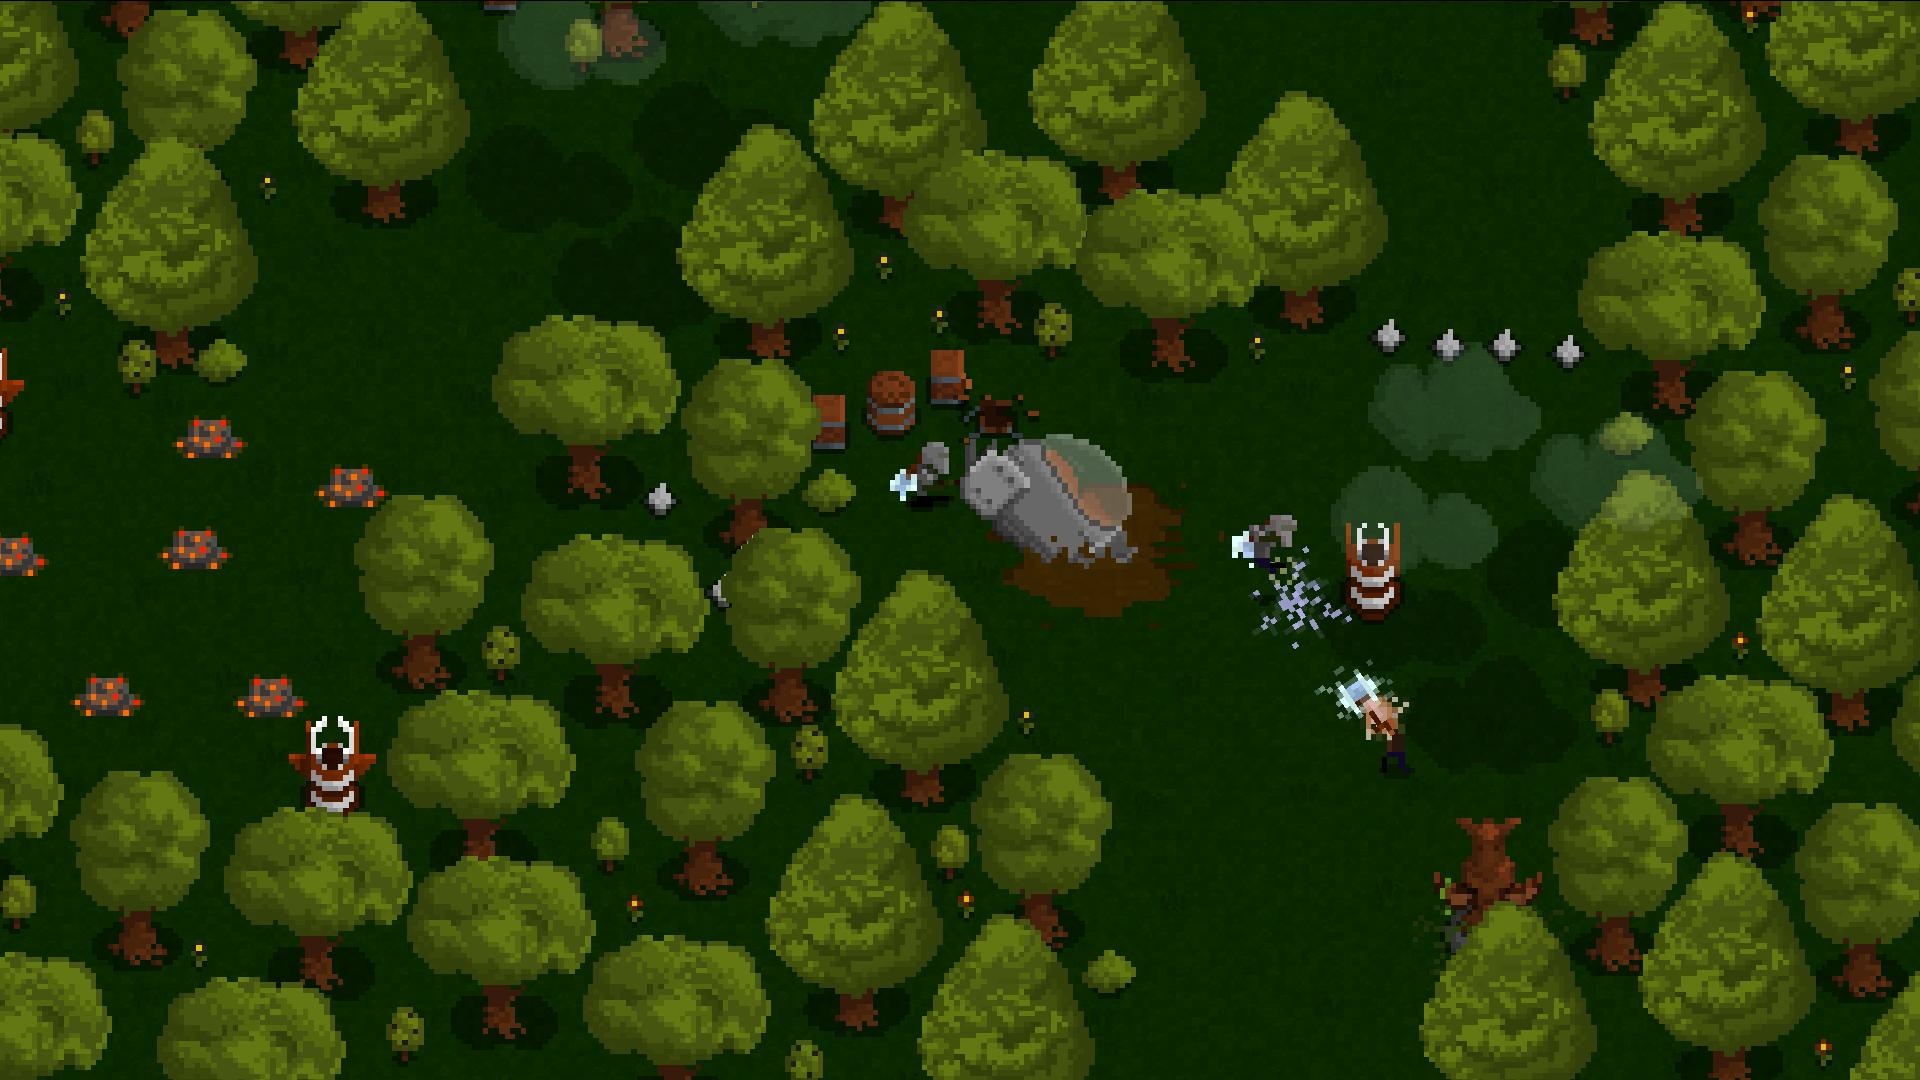 Totem - Action, Rpg in Steam Greenlight. - Изображение 1